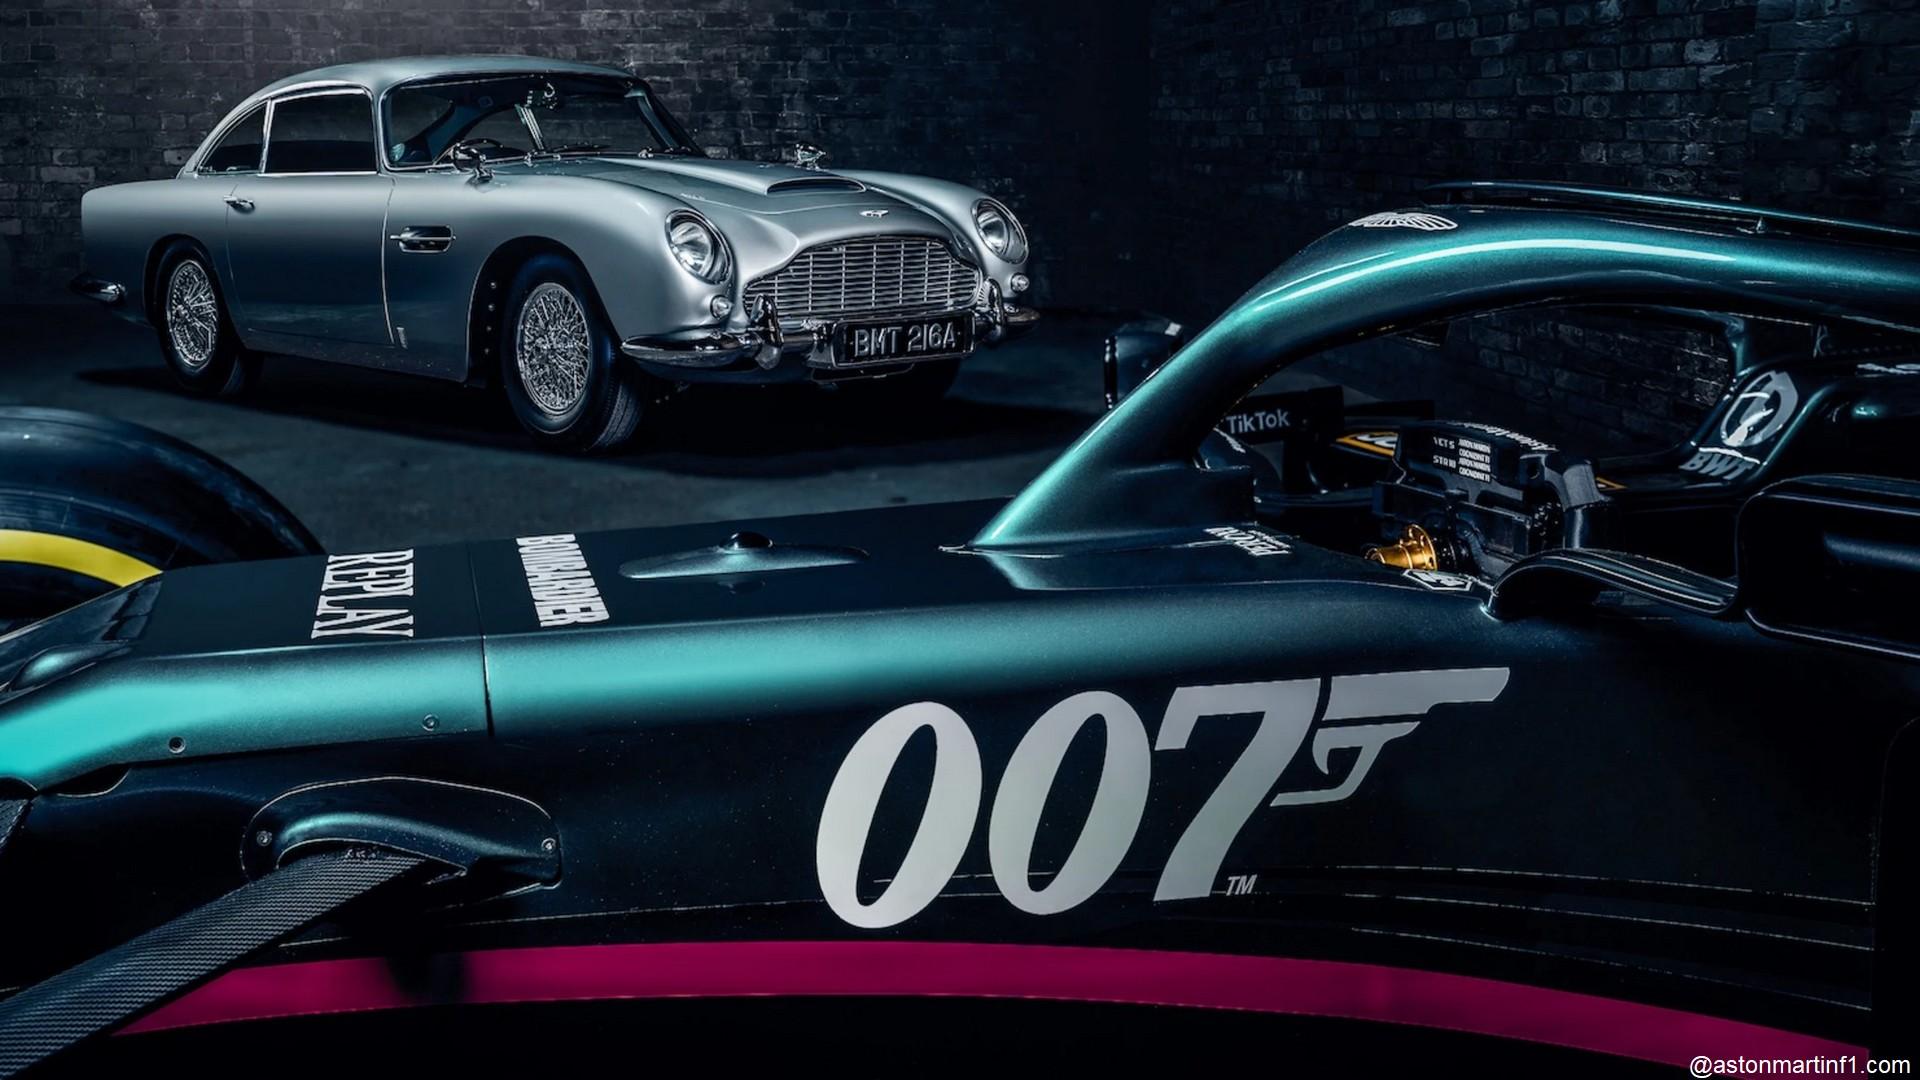 F1 Aston Martin James Bond 007